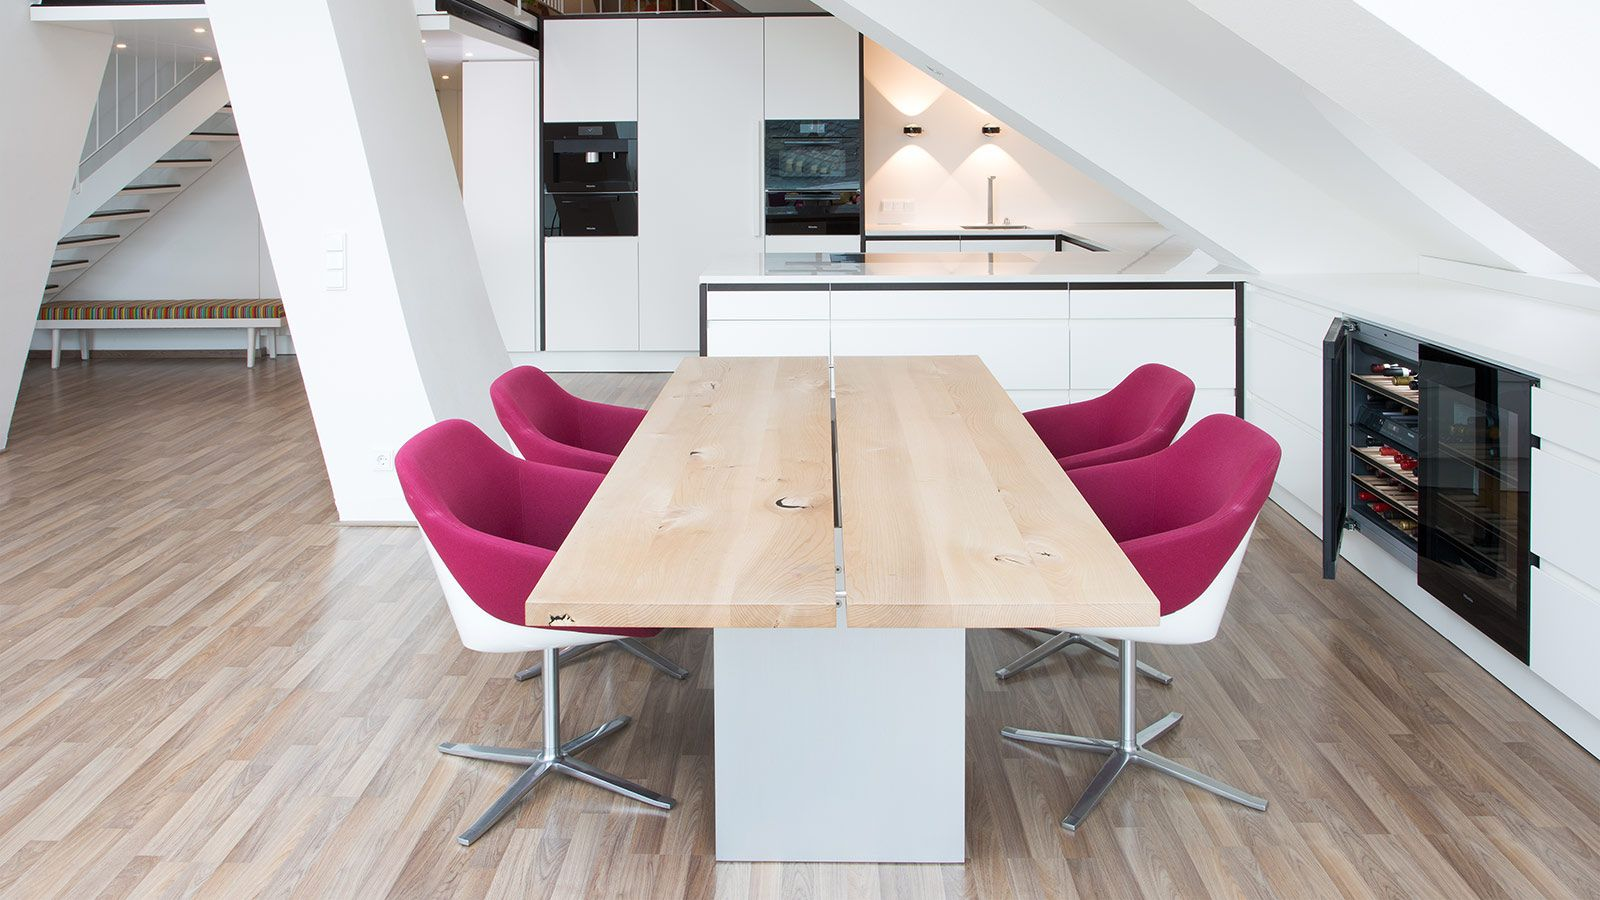 Innenarchitektur Köln küche im loft köln beilstein innenarchitektur köln